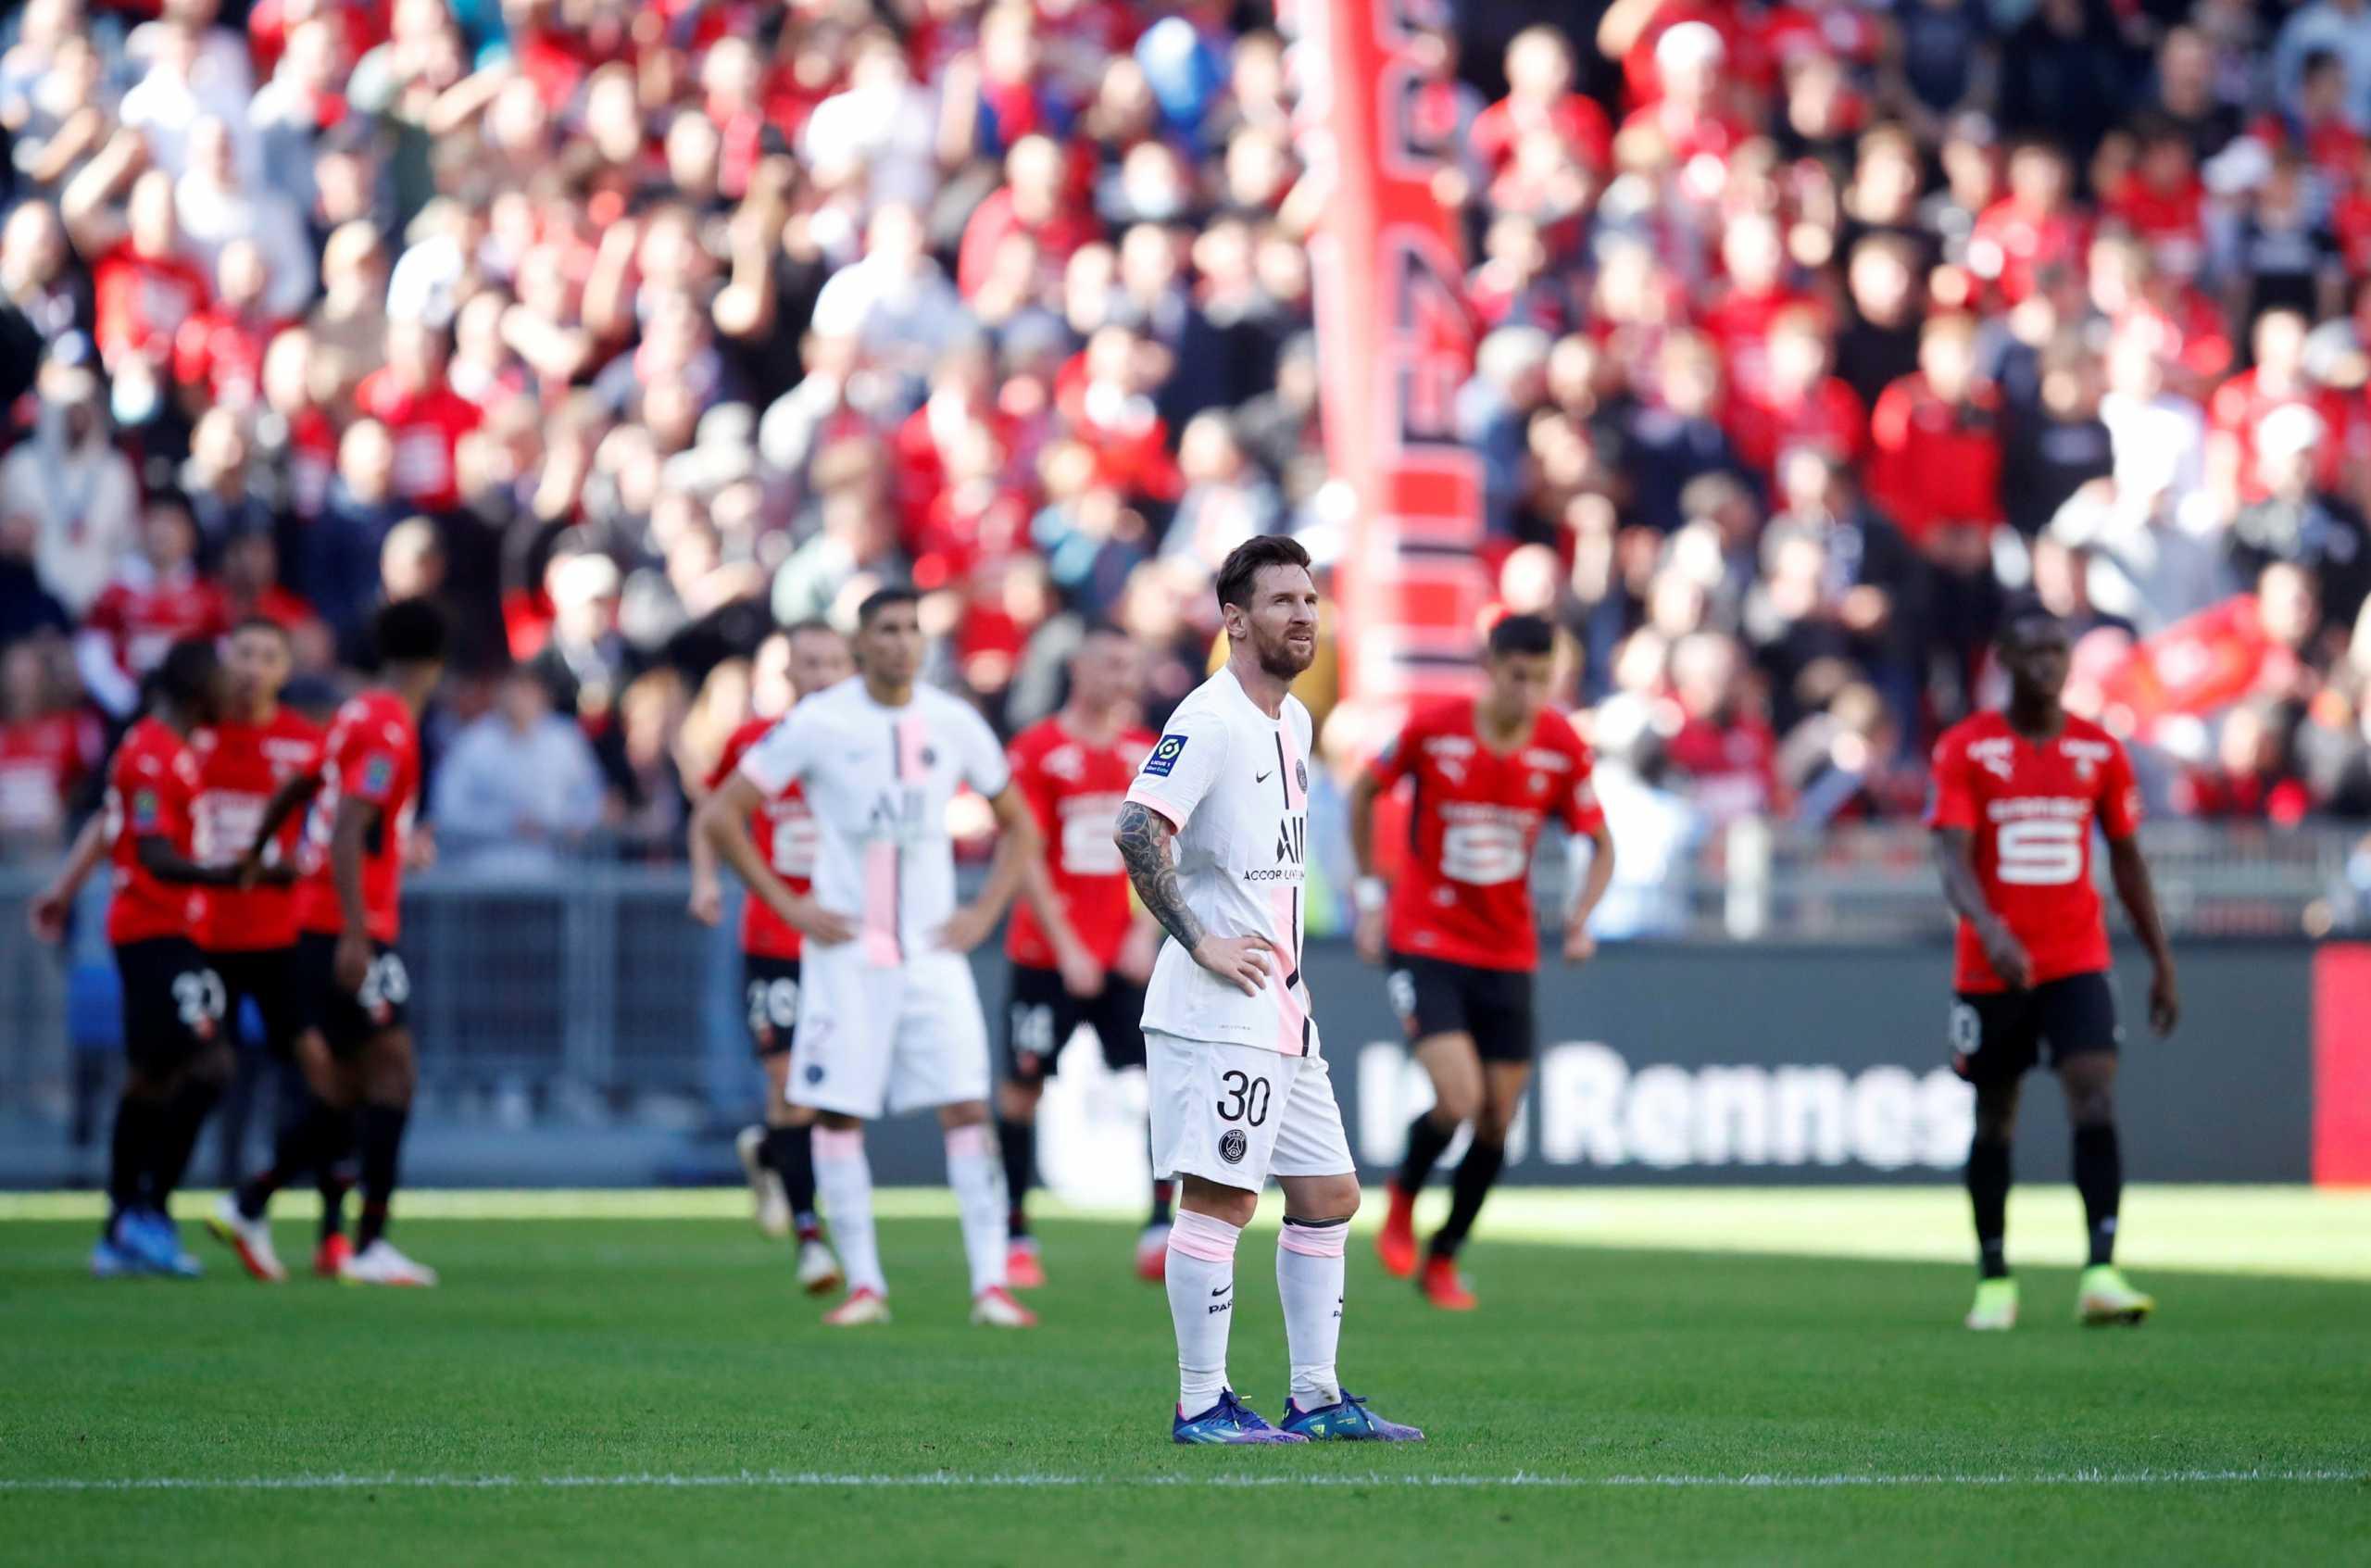 Ligue 1, Ρεν – Παρί Σεν Ζερμέν 2-0: «Σφαλιάρα» για Μέσι, Νέιμαρ και Εμπαπέ